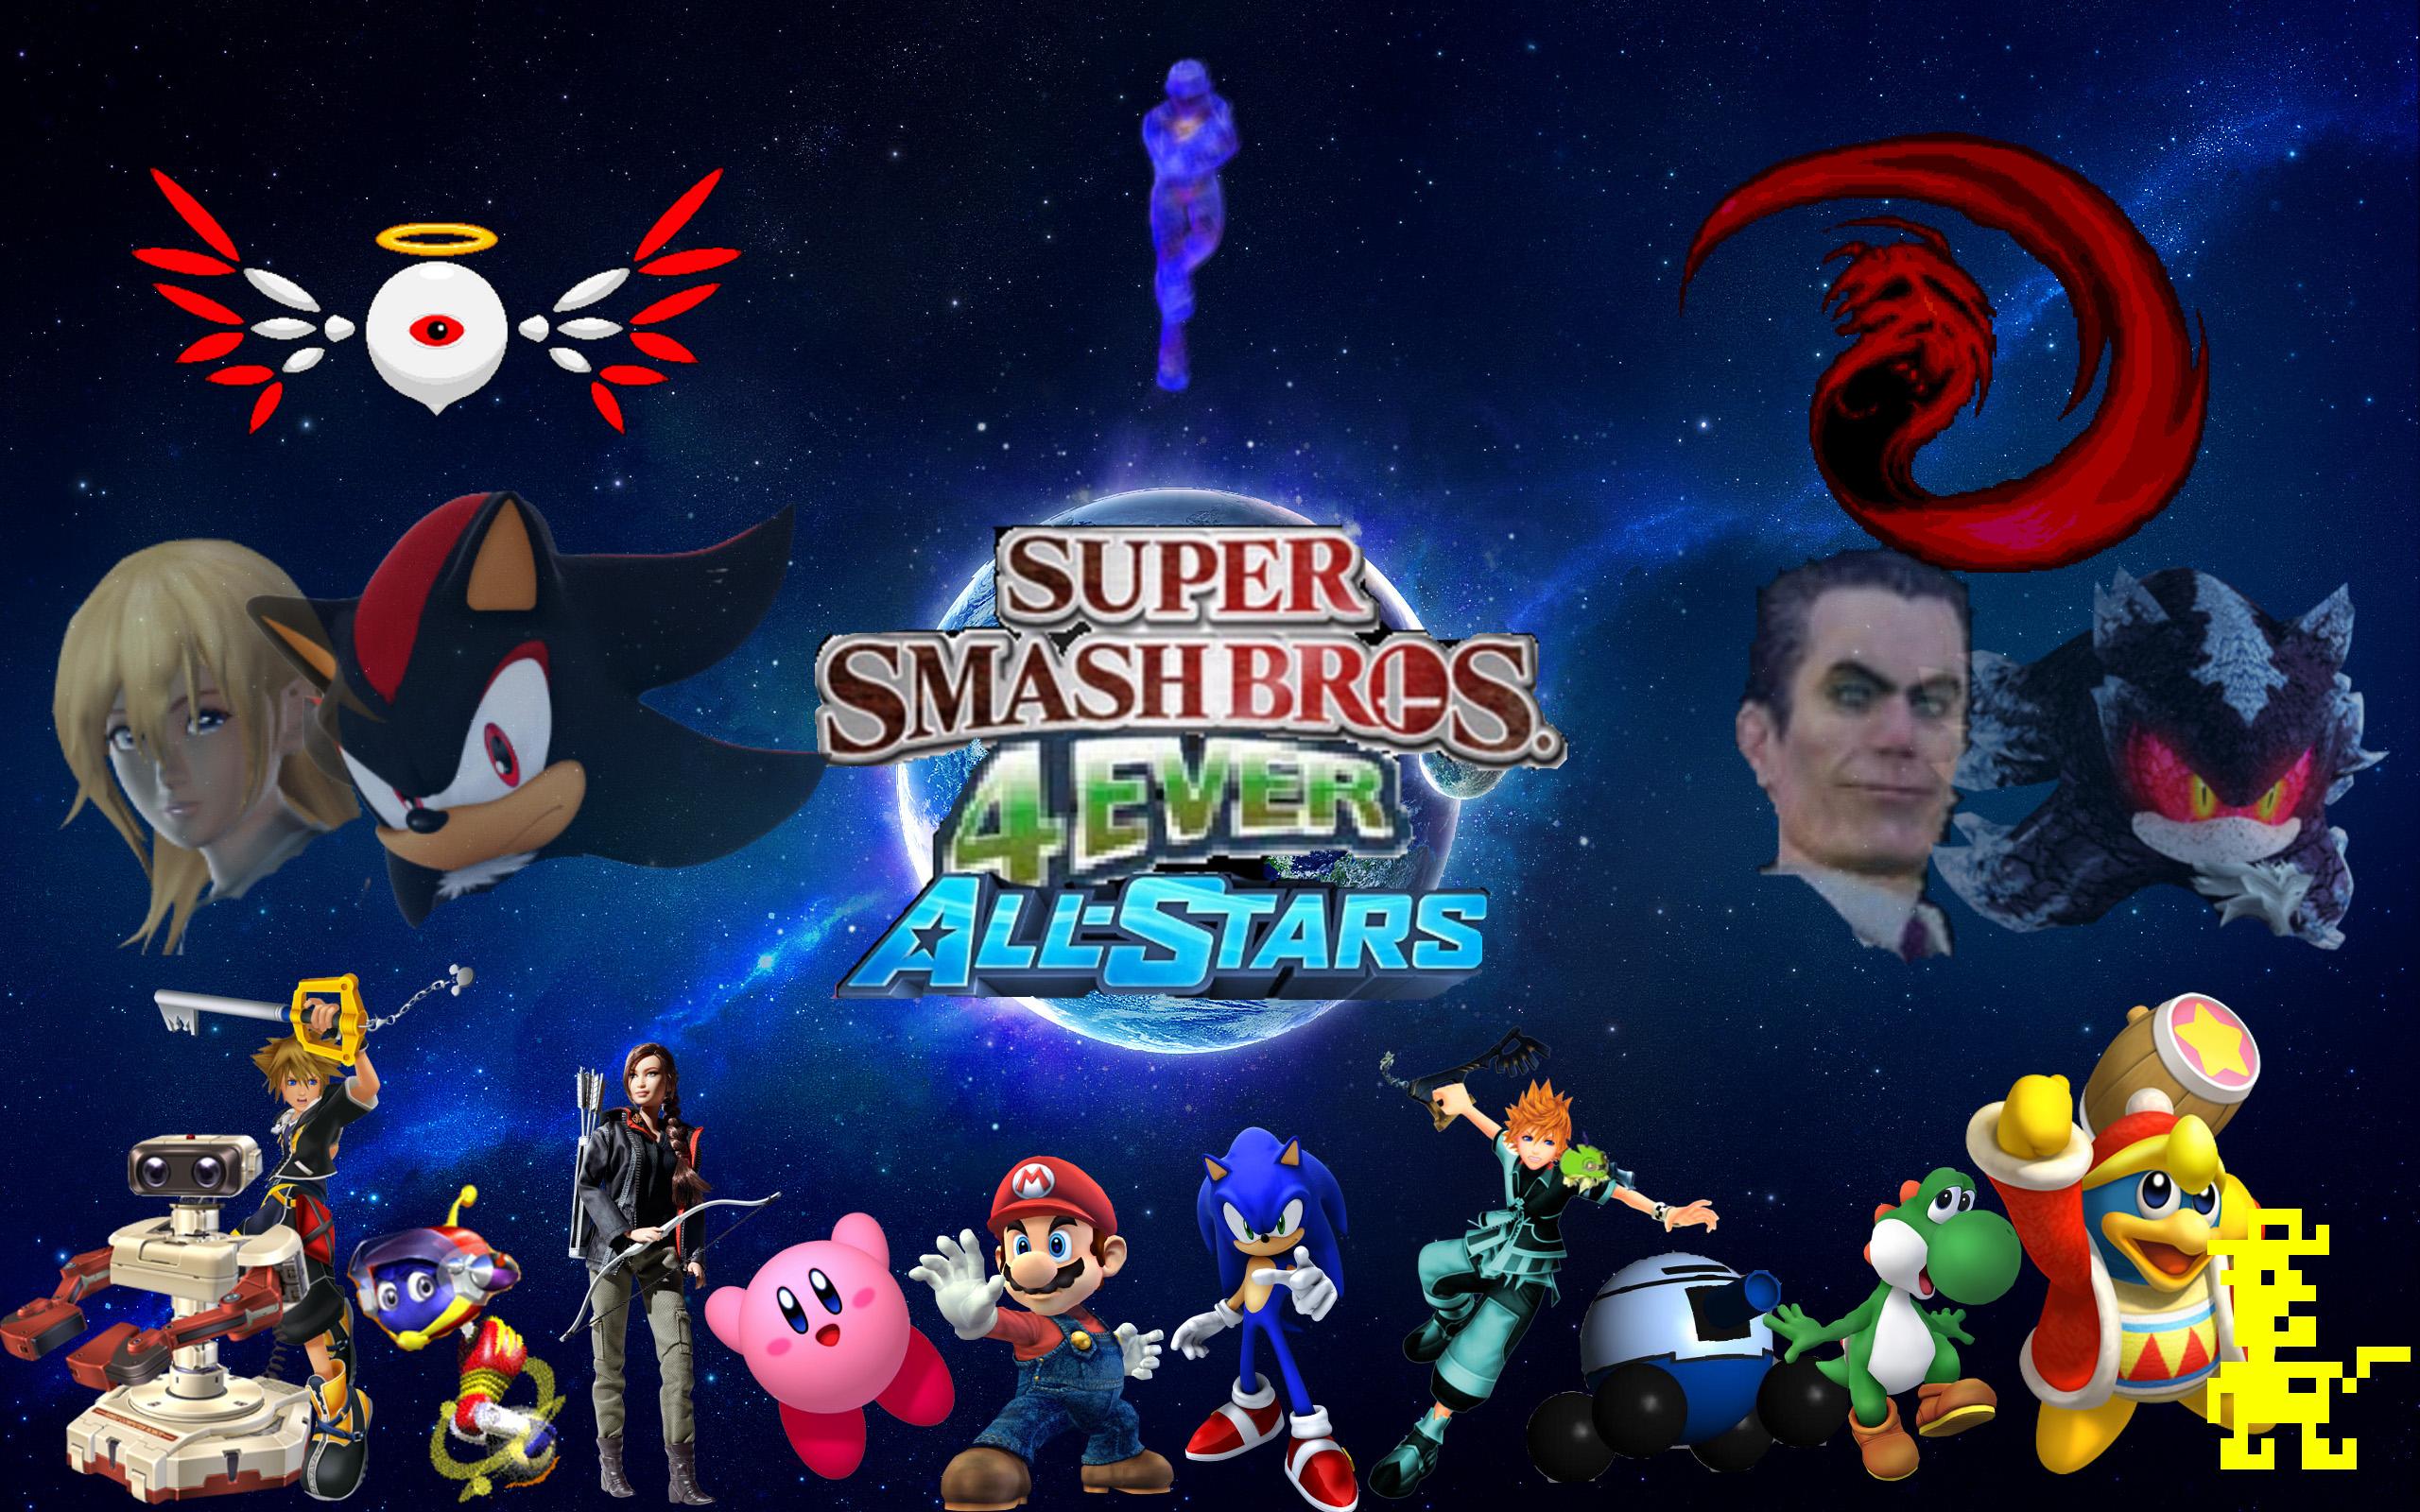 RoxasXIIkeys Super Smash Bros 4ever All Stars Wallpaper 2 By